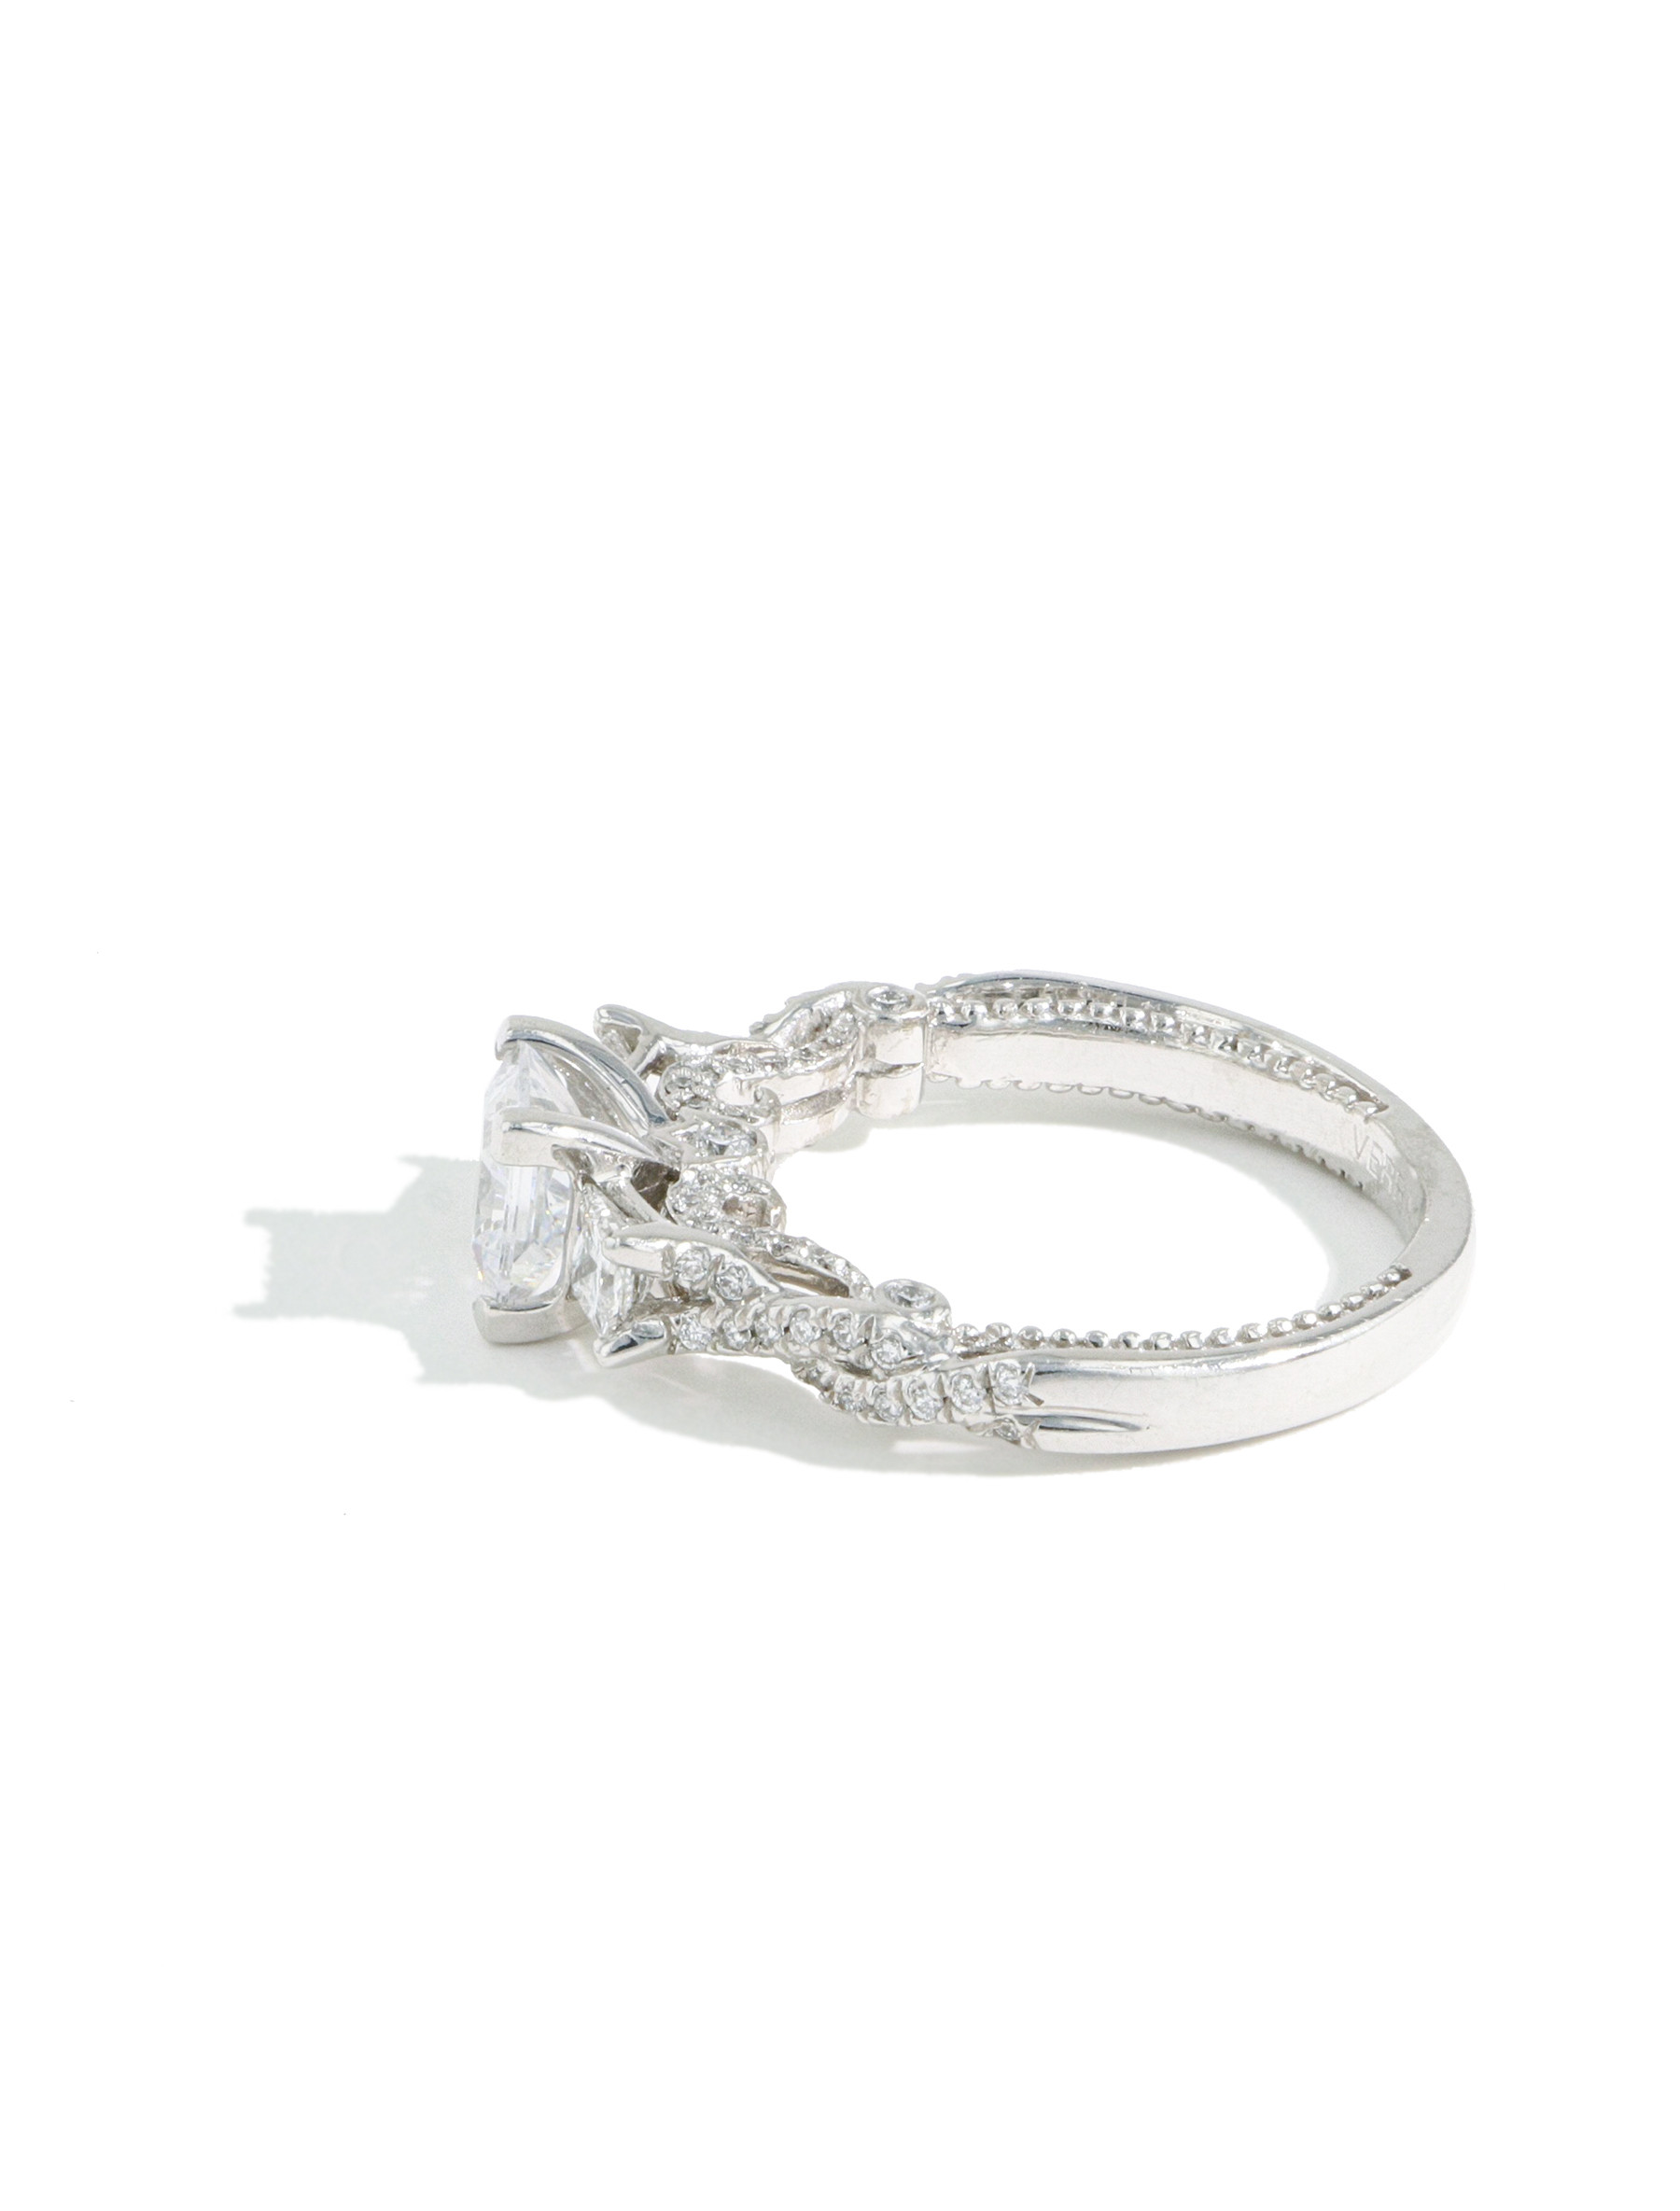 Verragio Insignia Princess Cut Diamond Three Stone Engagement Ring Setting side view